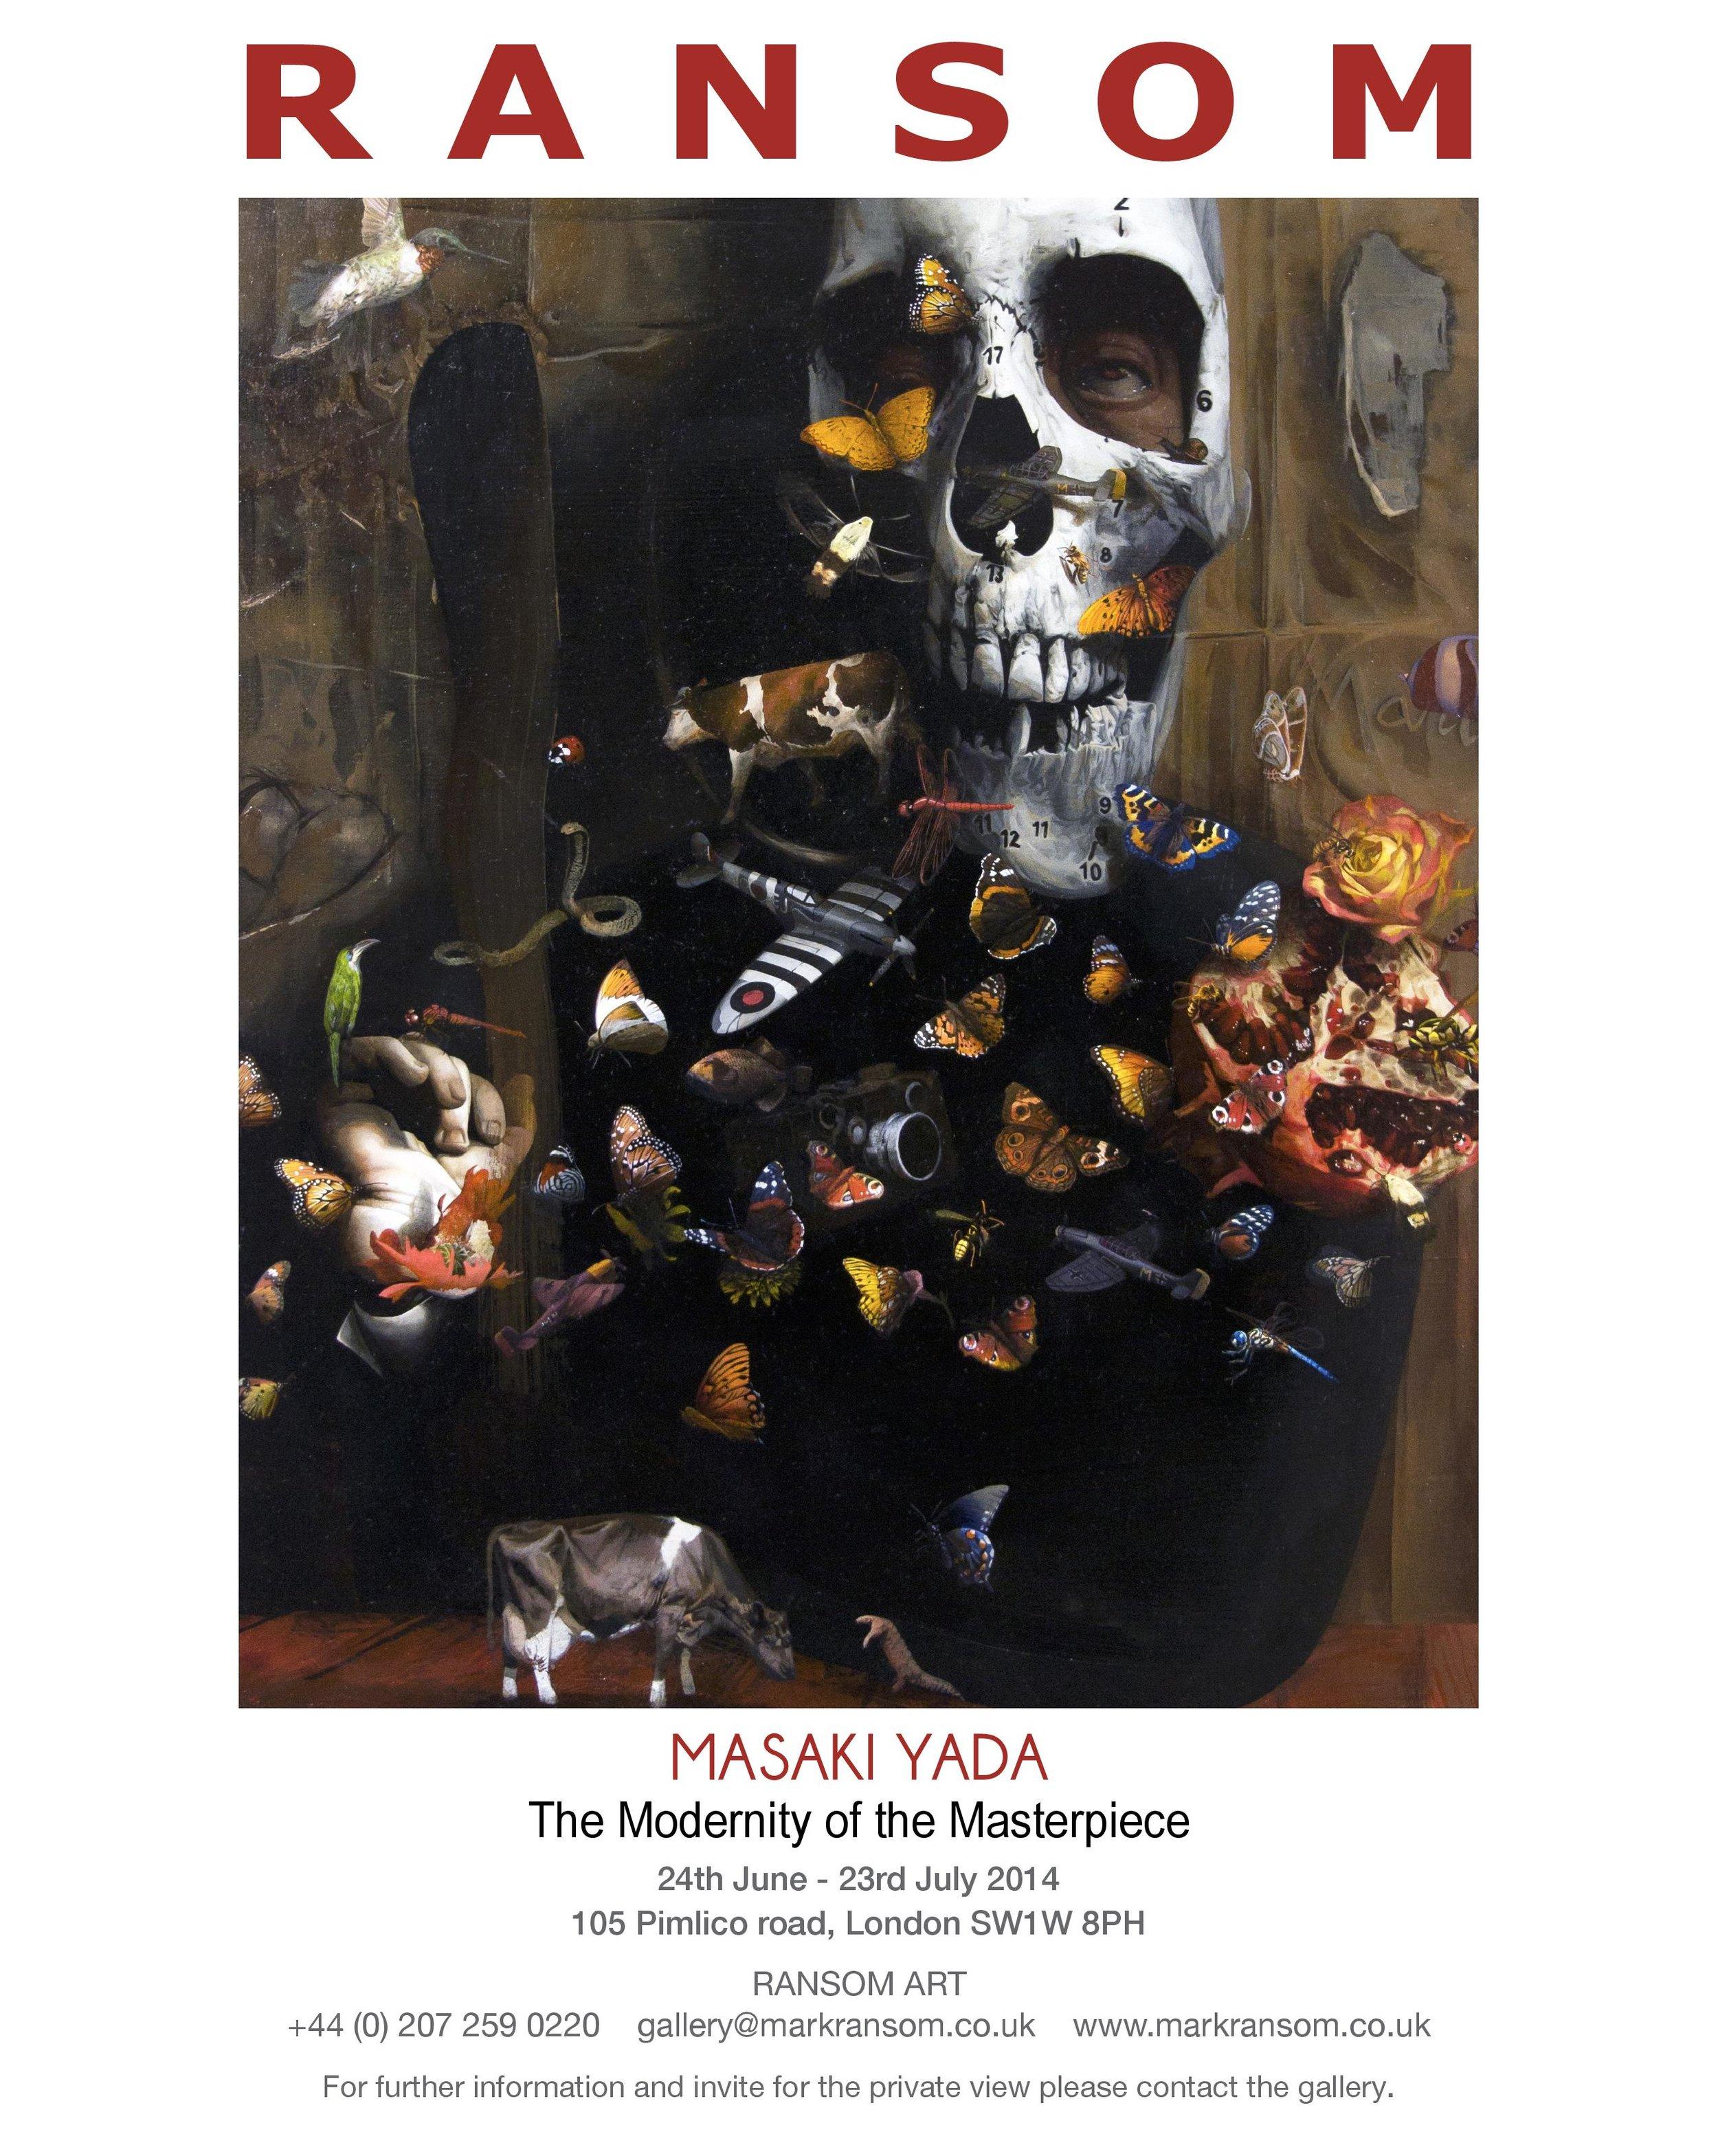 invitation-masaki-yada-exhibition-ransom-art-gallery